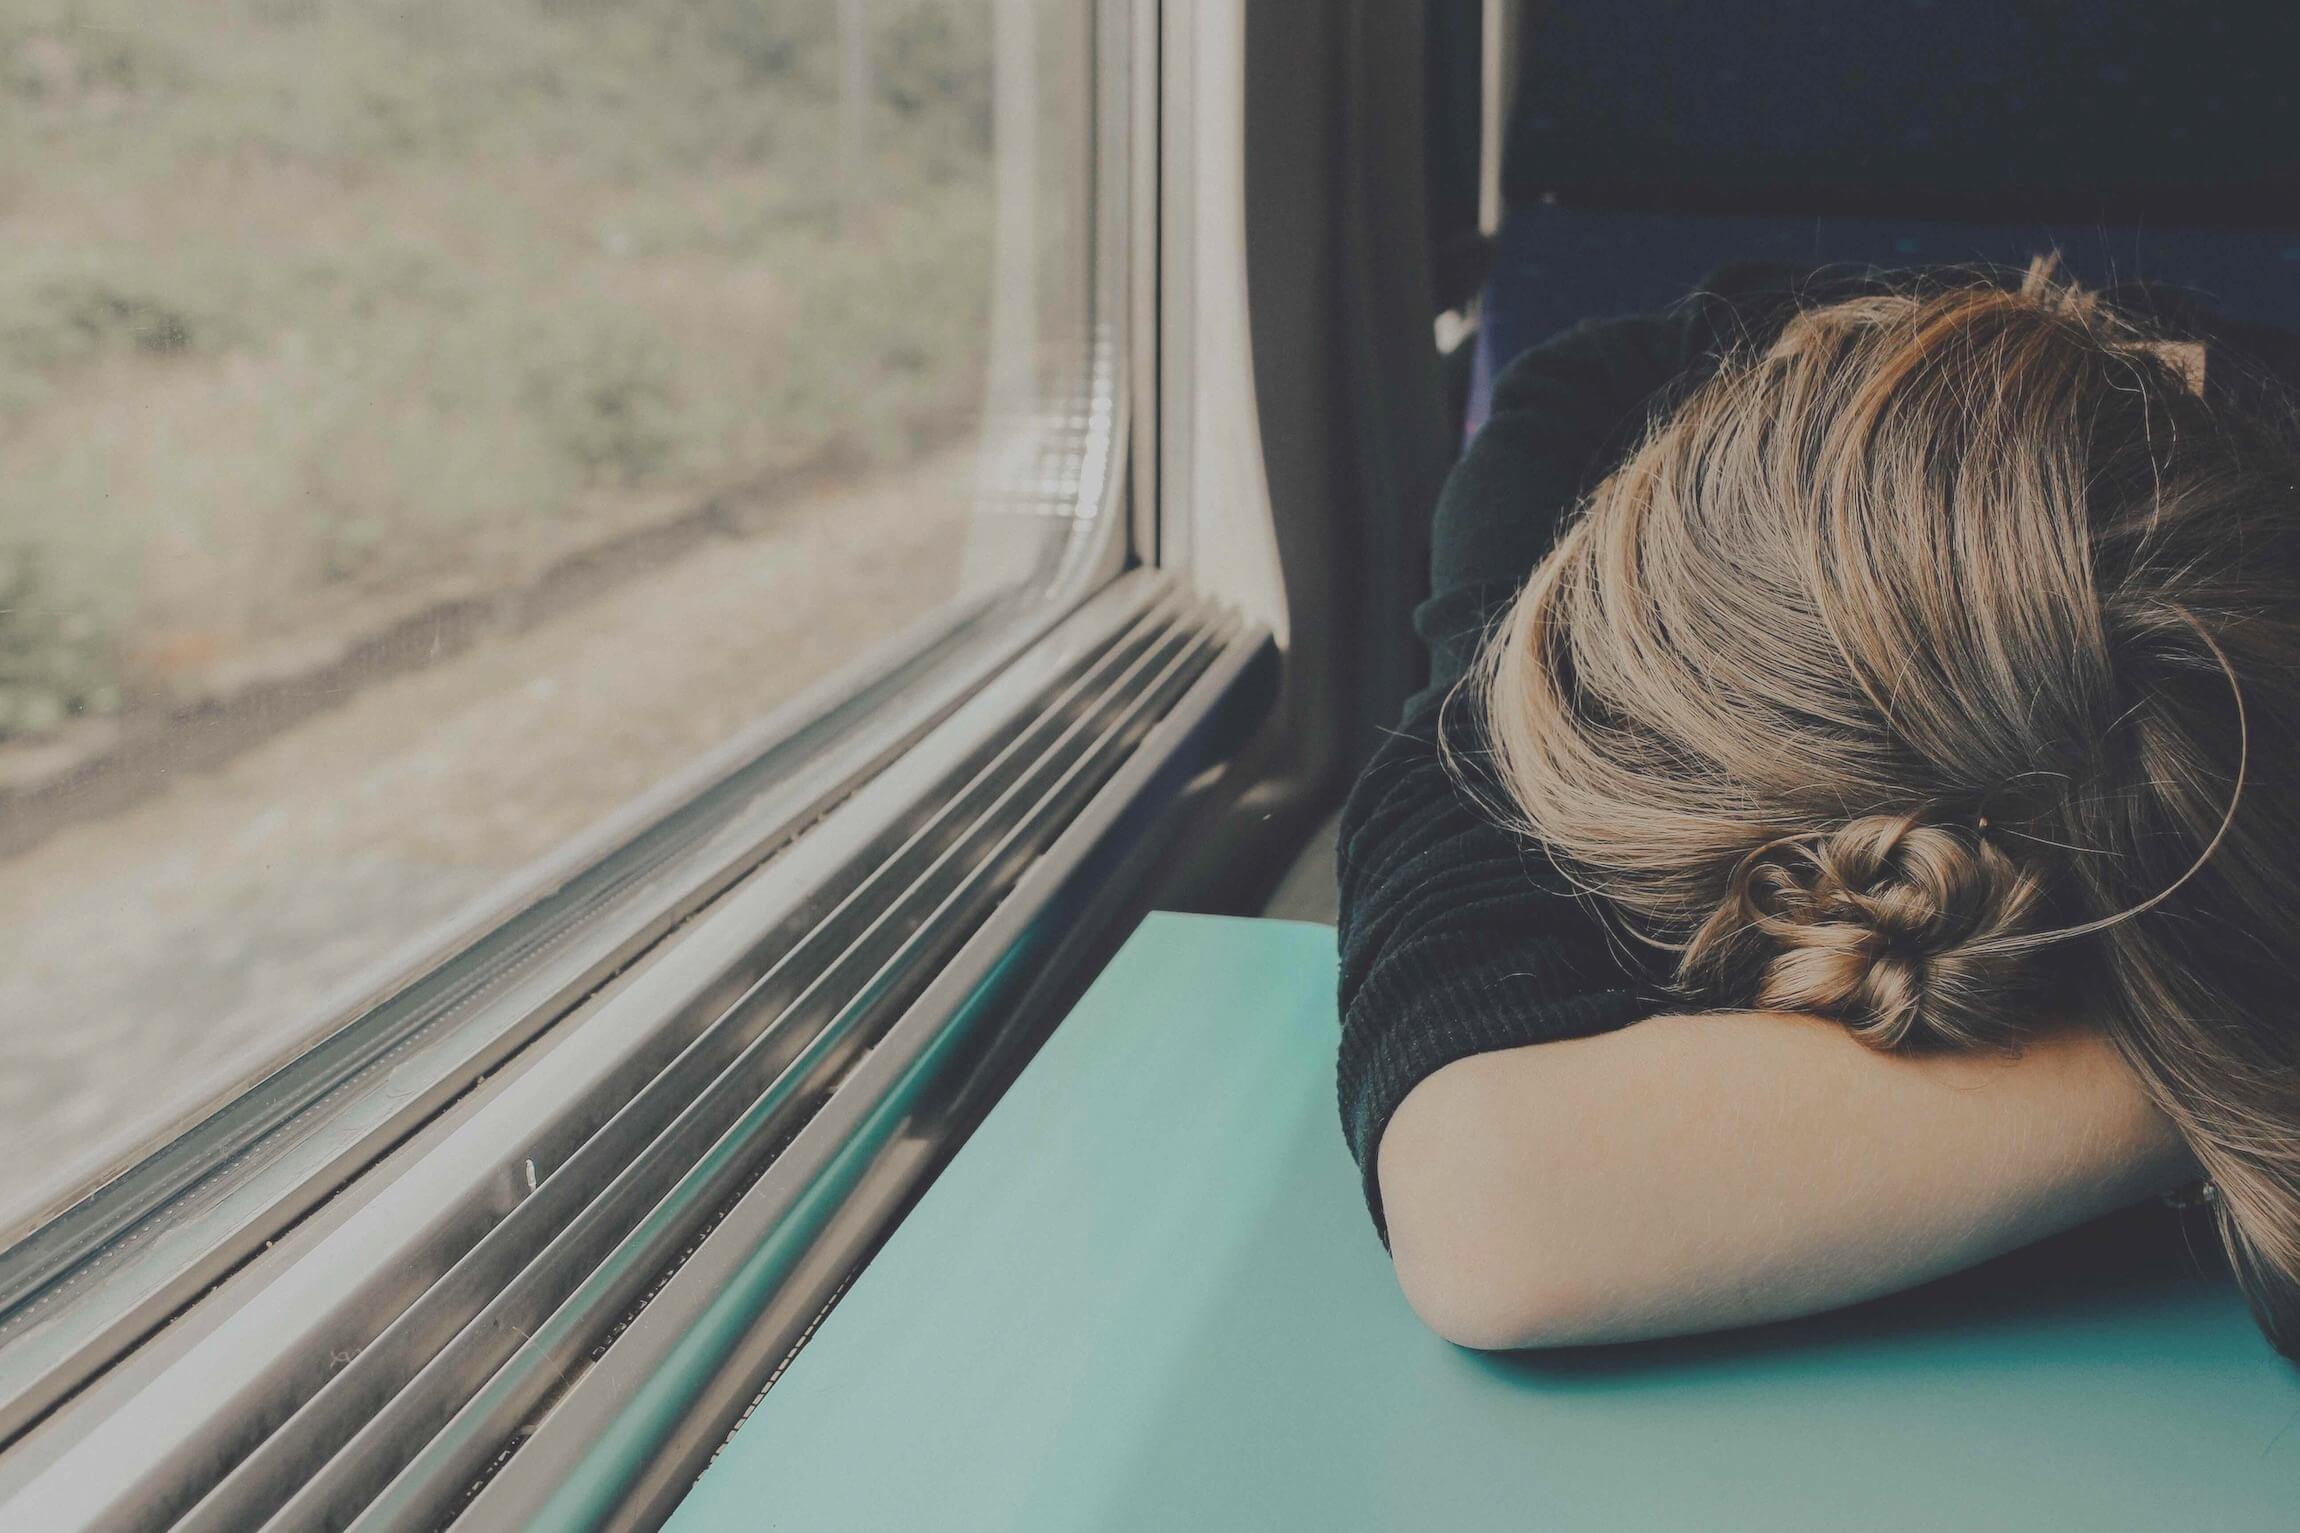 depressed woman feeling hopeless